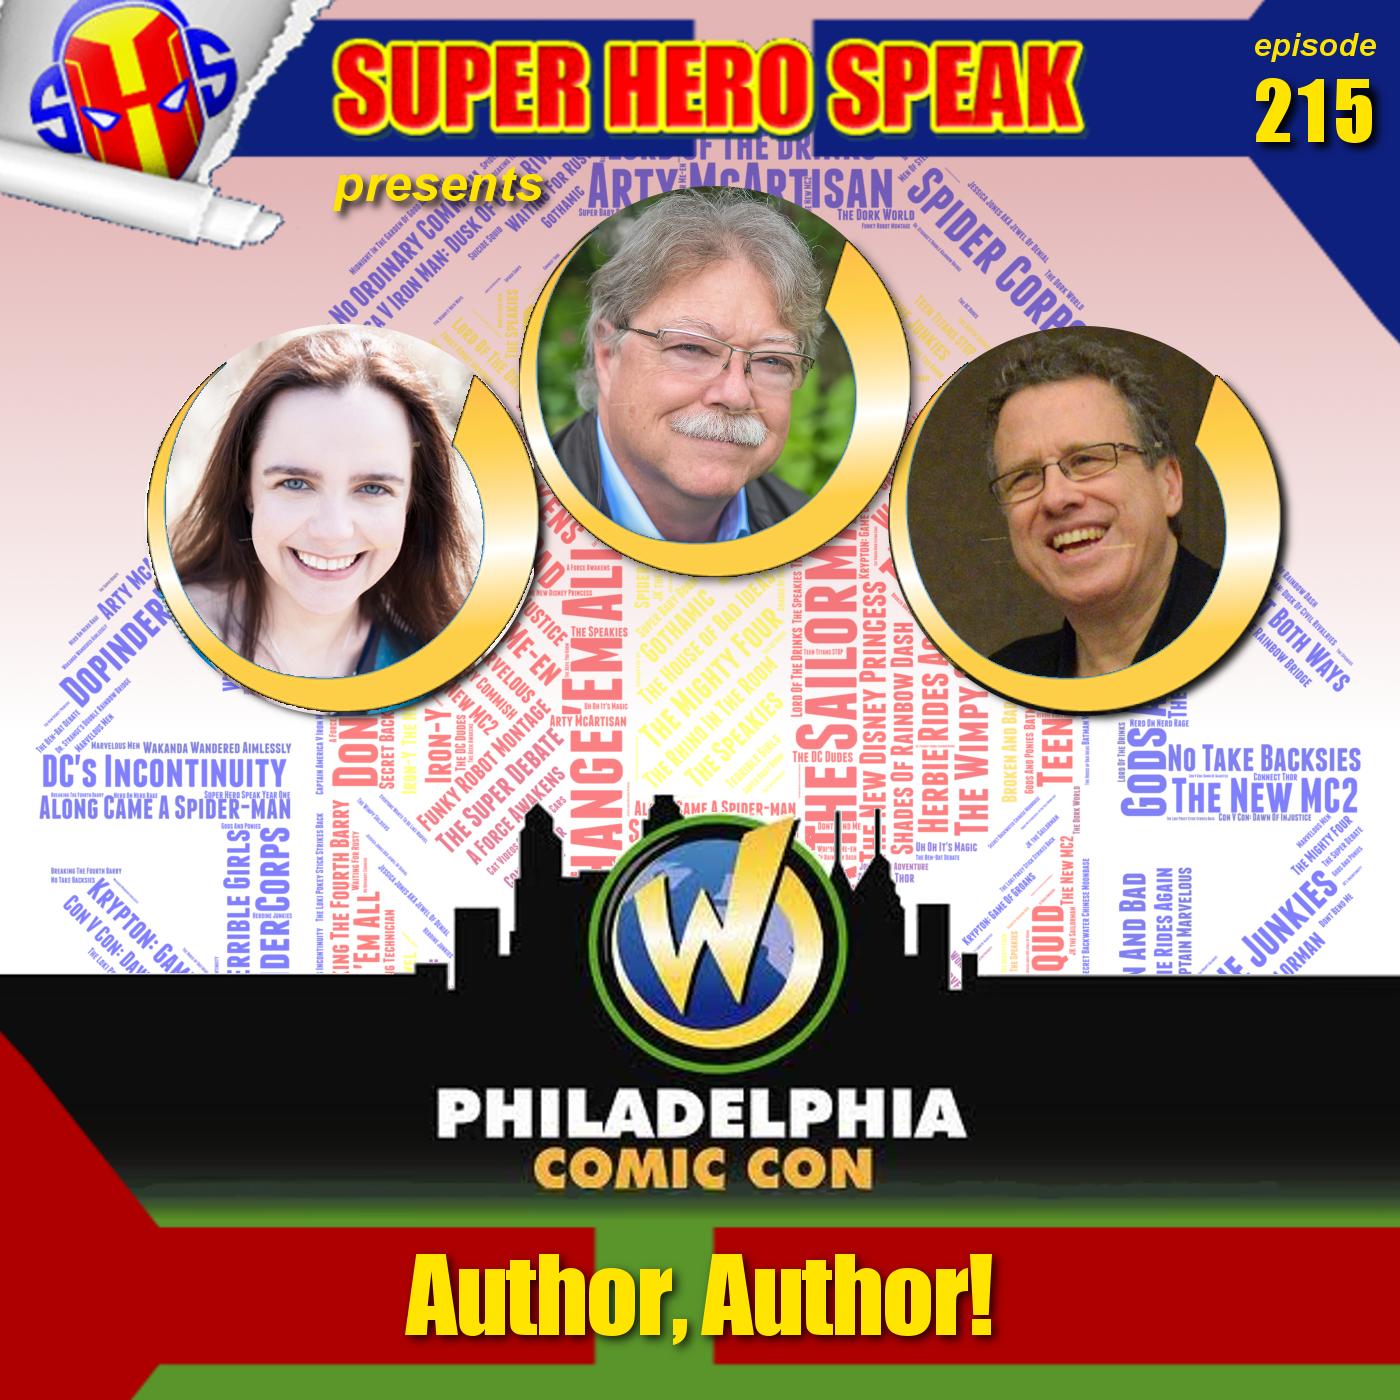 #215: Author, Author!